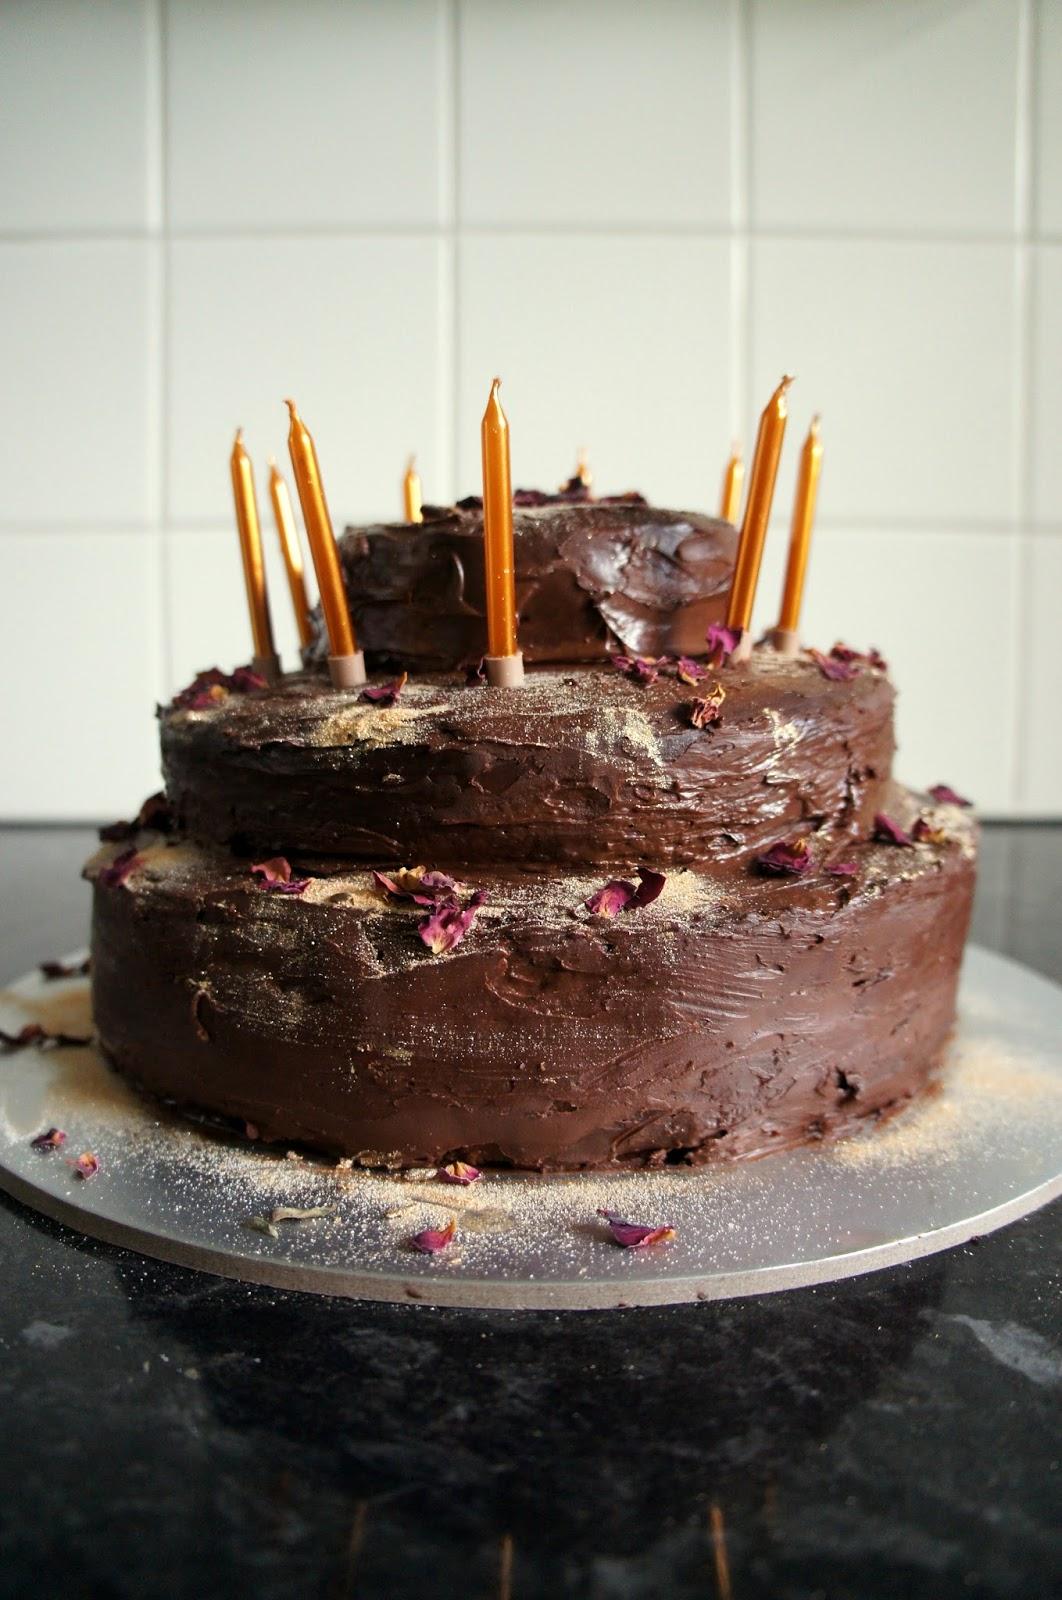 Tiered Orange Sponge Cake With Chocolate Ganache Icing